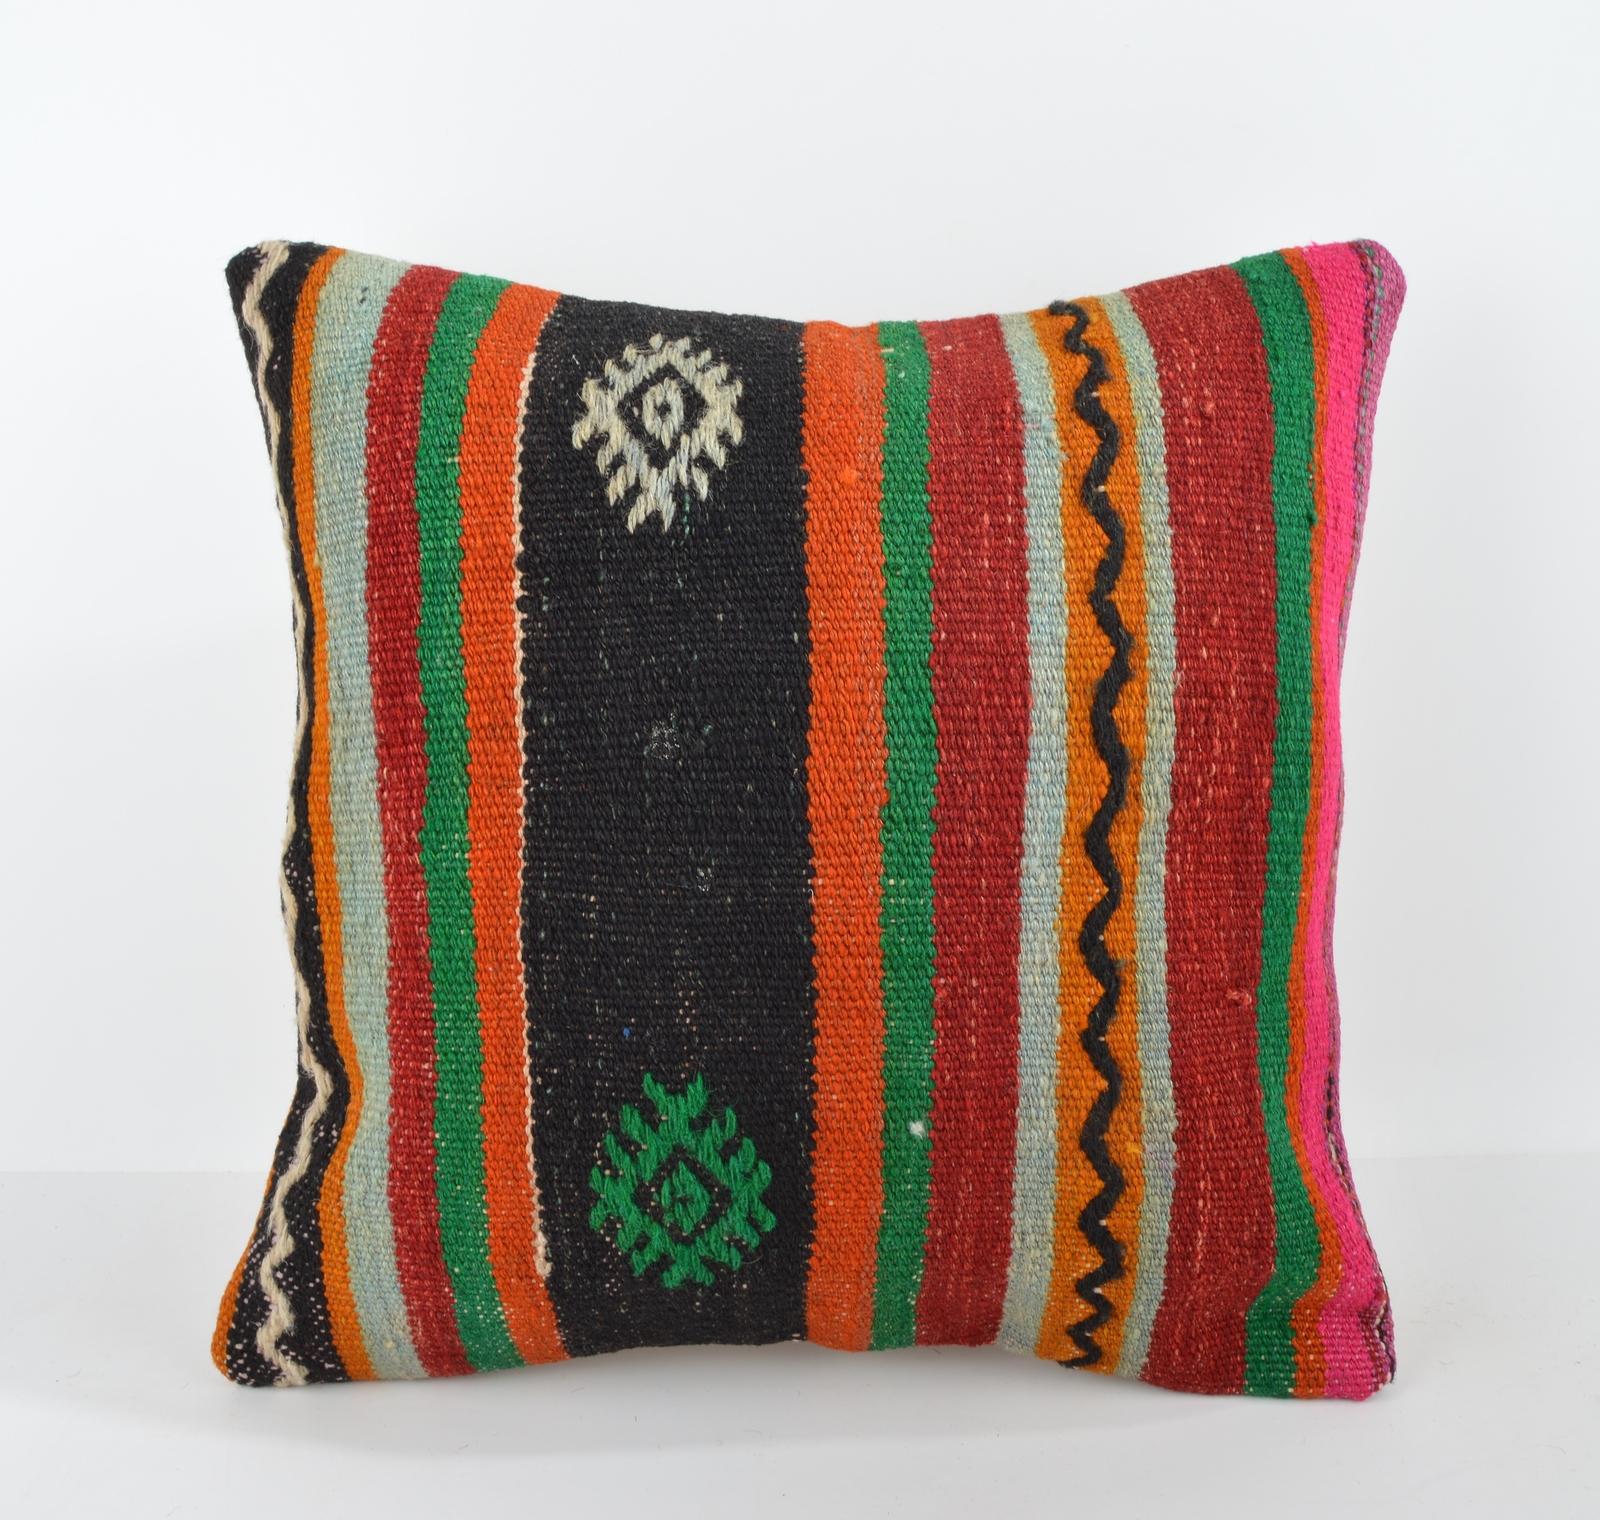 Modern Bolster Pillows : Cushion cover,Modern decor,Colorful pillow,Kilim Bolster,Rustic Decor 16x16 inch - Pillows